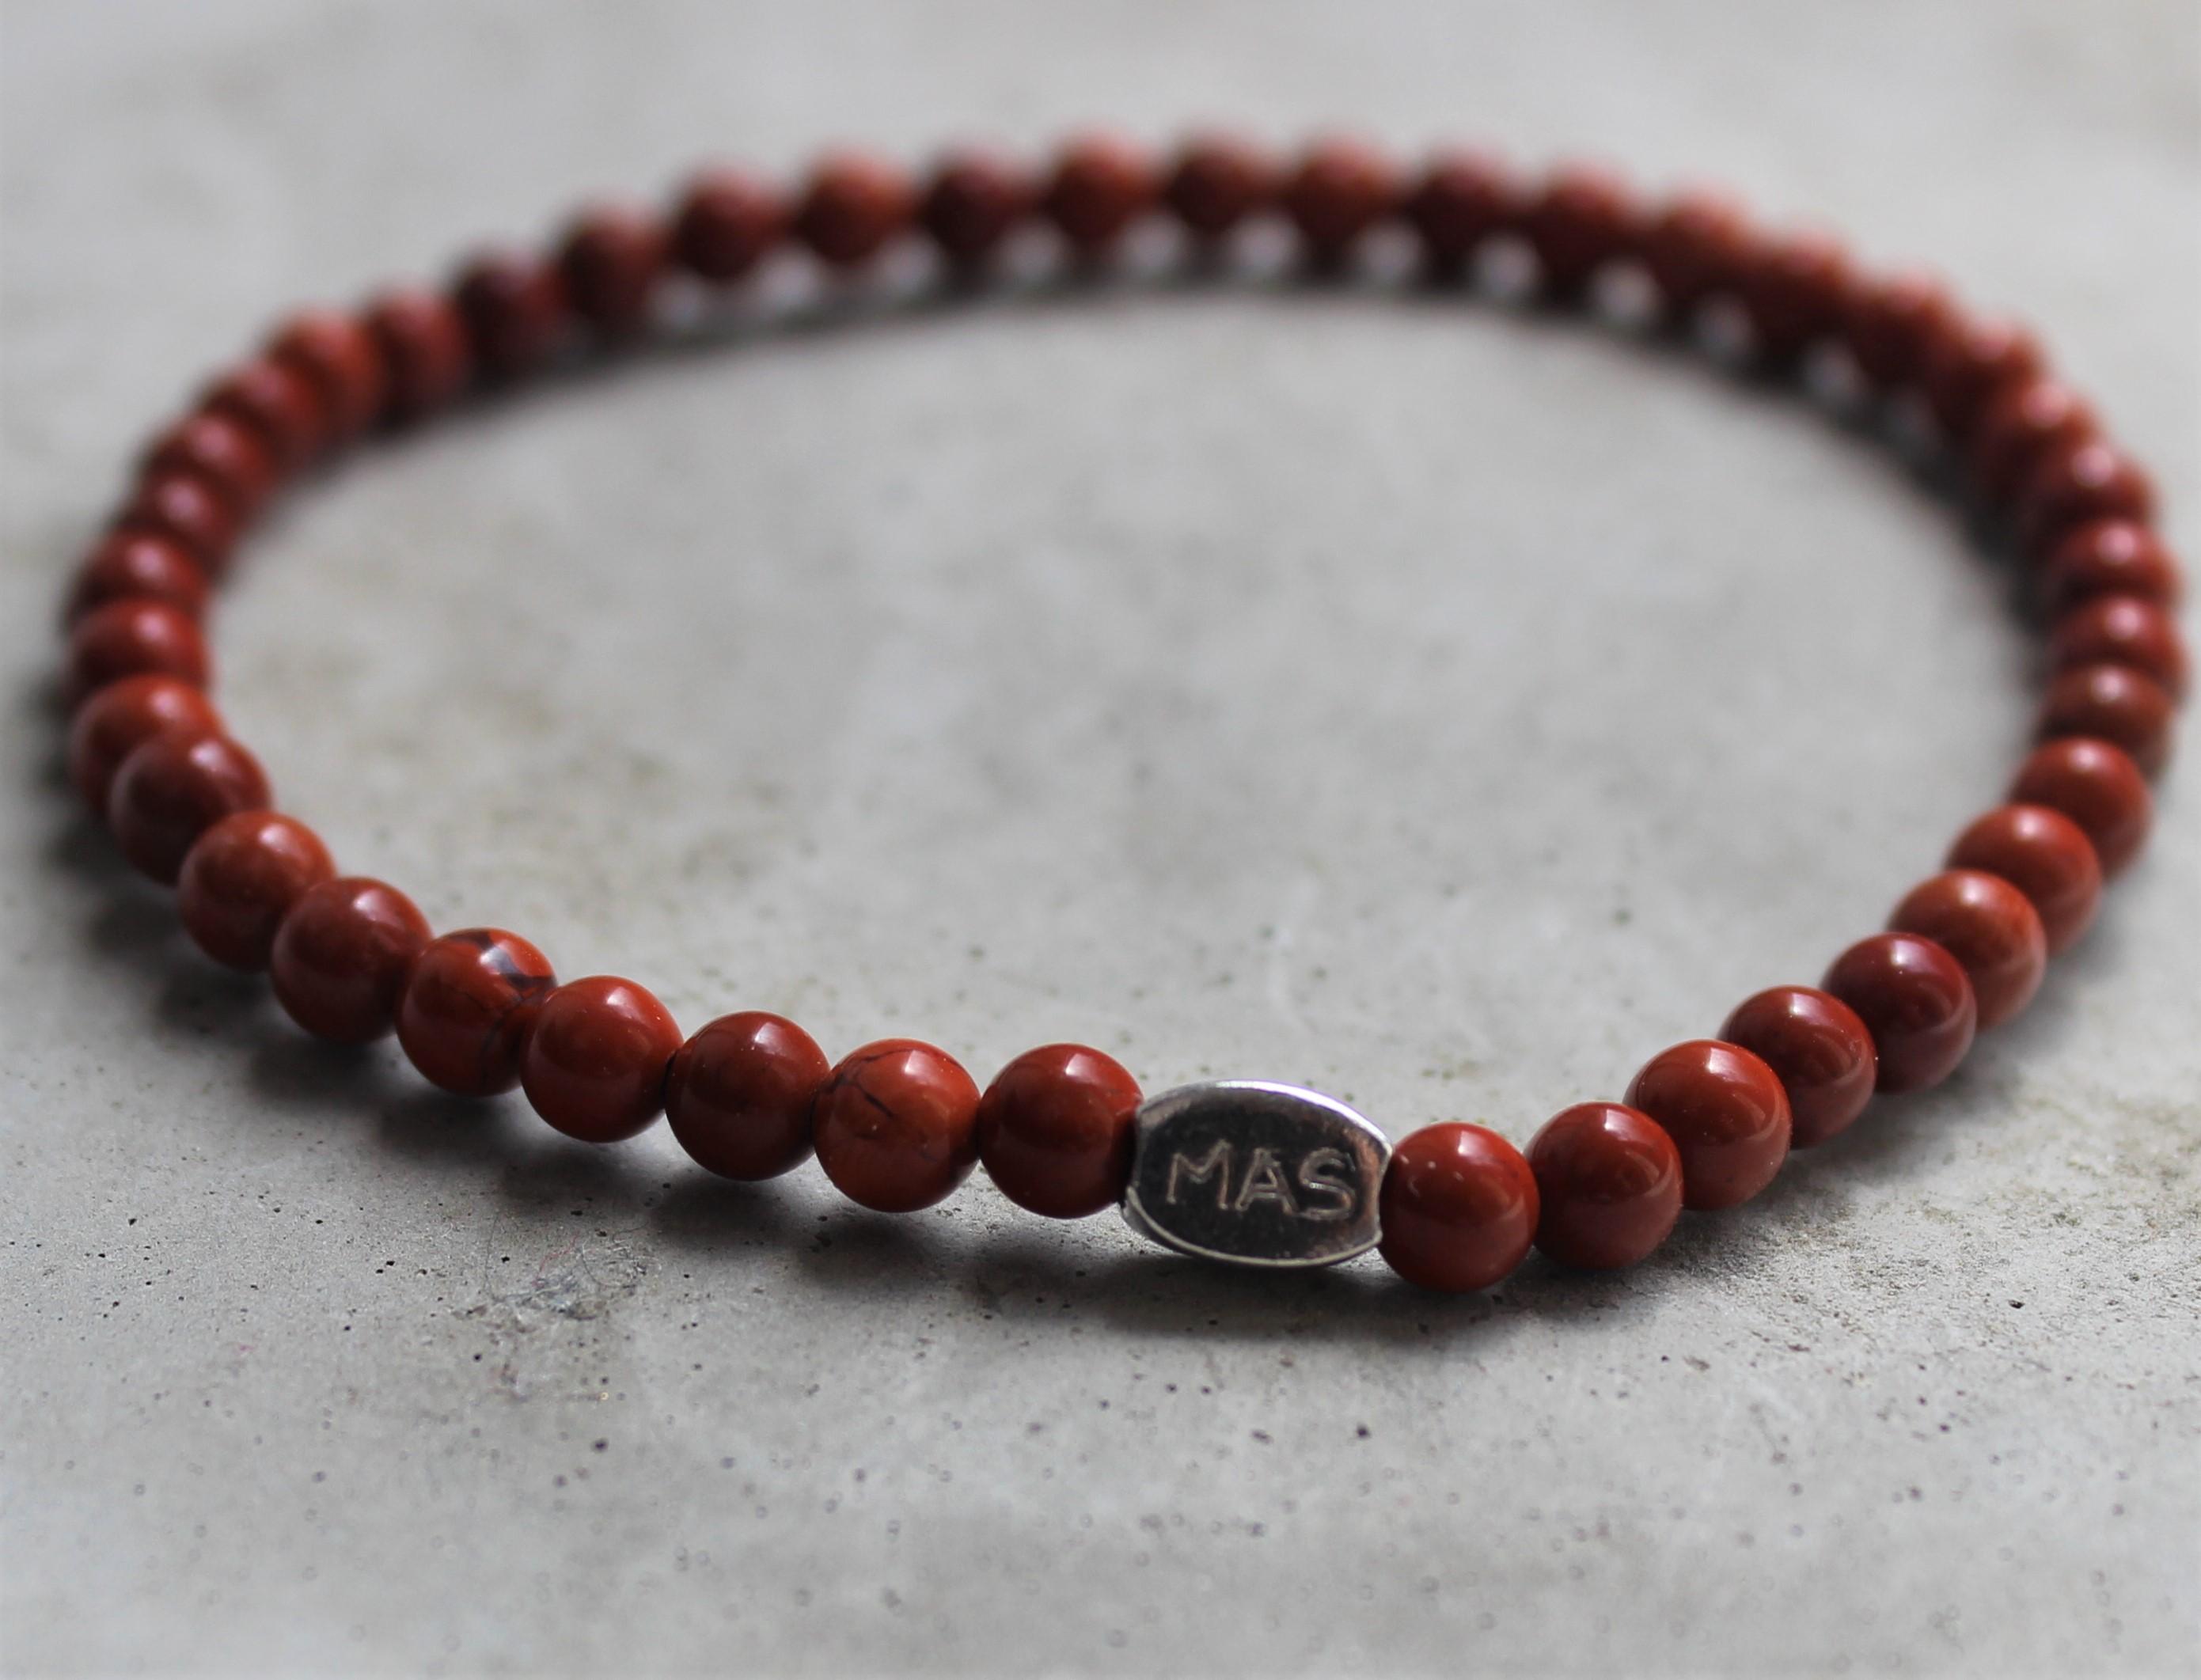 Armbaender für Frauen - MAS jewelz Armband Roter Jaspis 4mm  - Onlineshop Tante Emmer